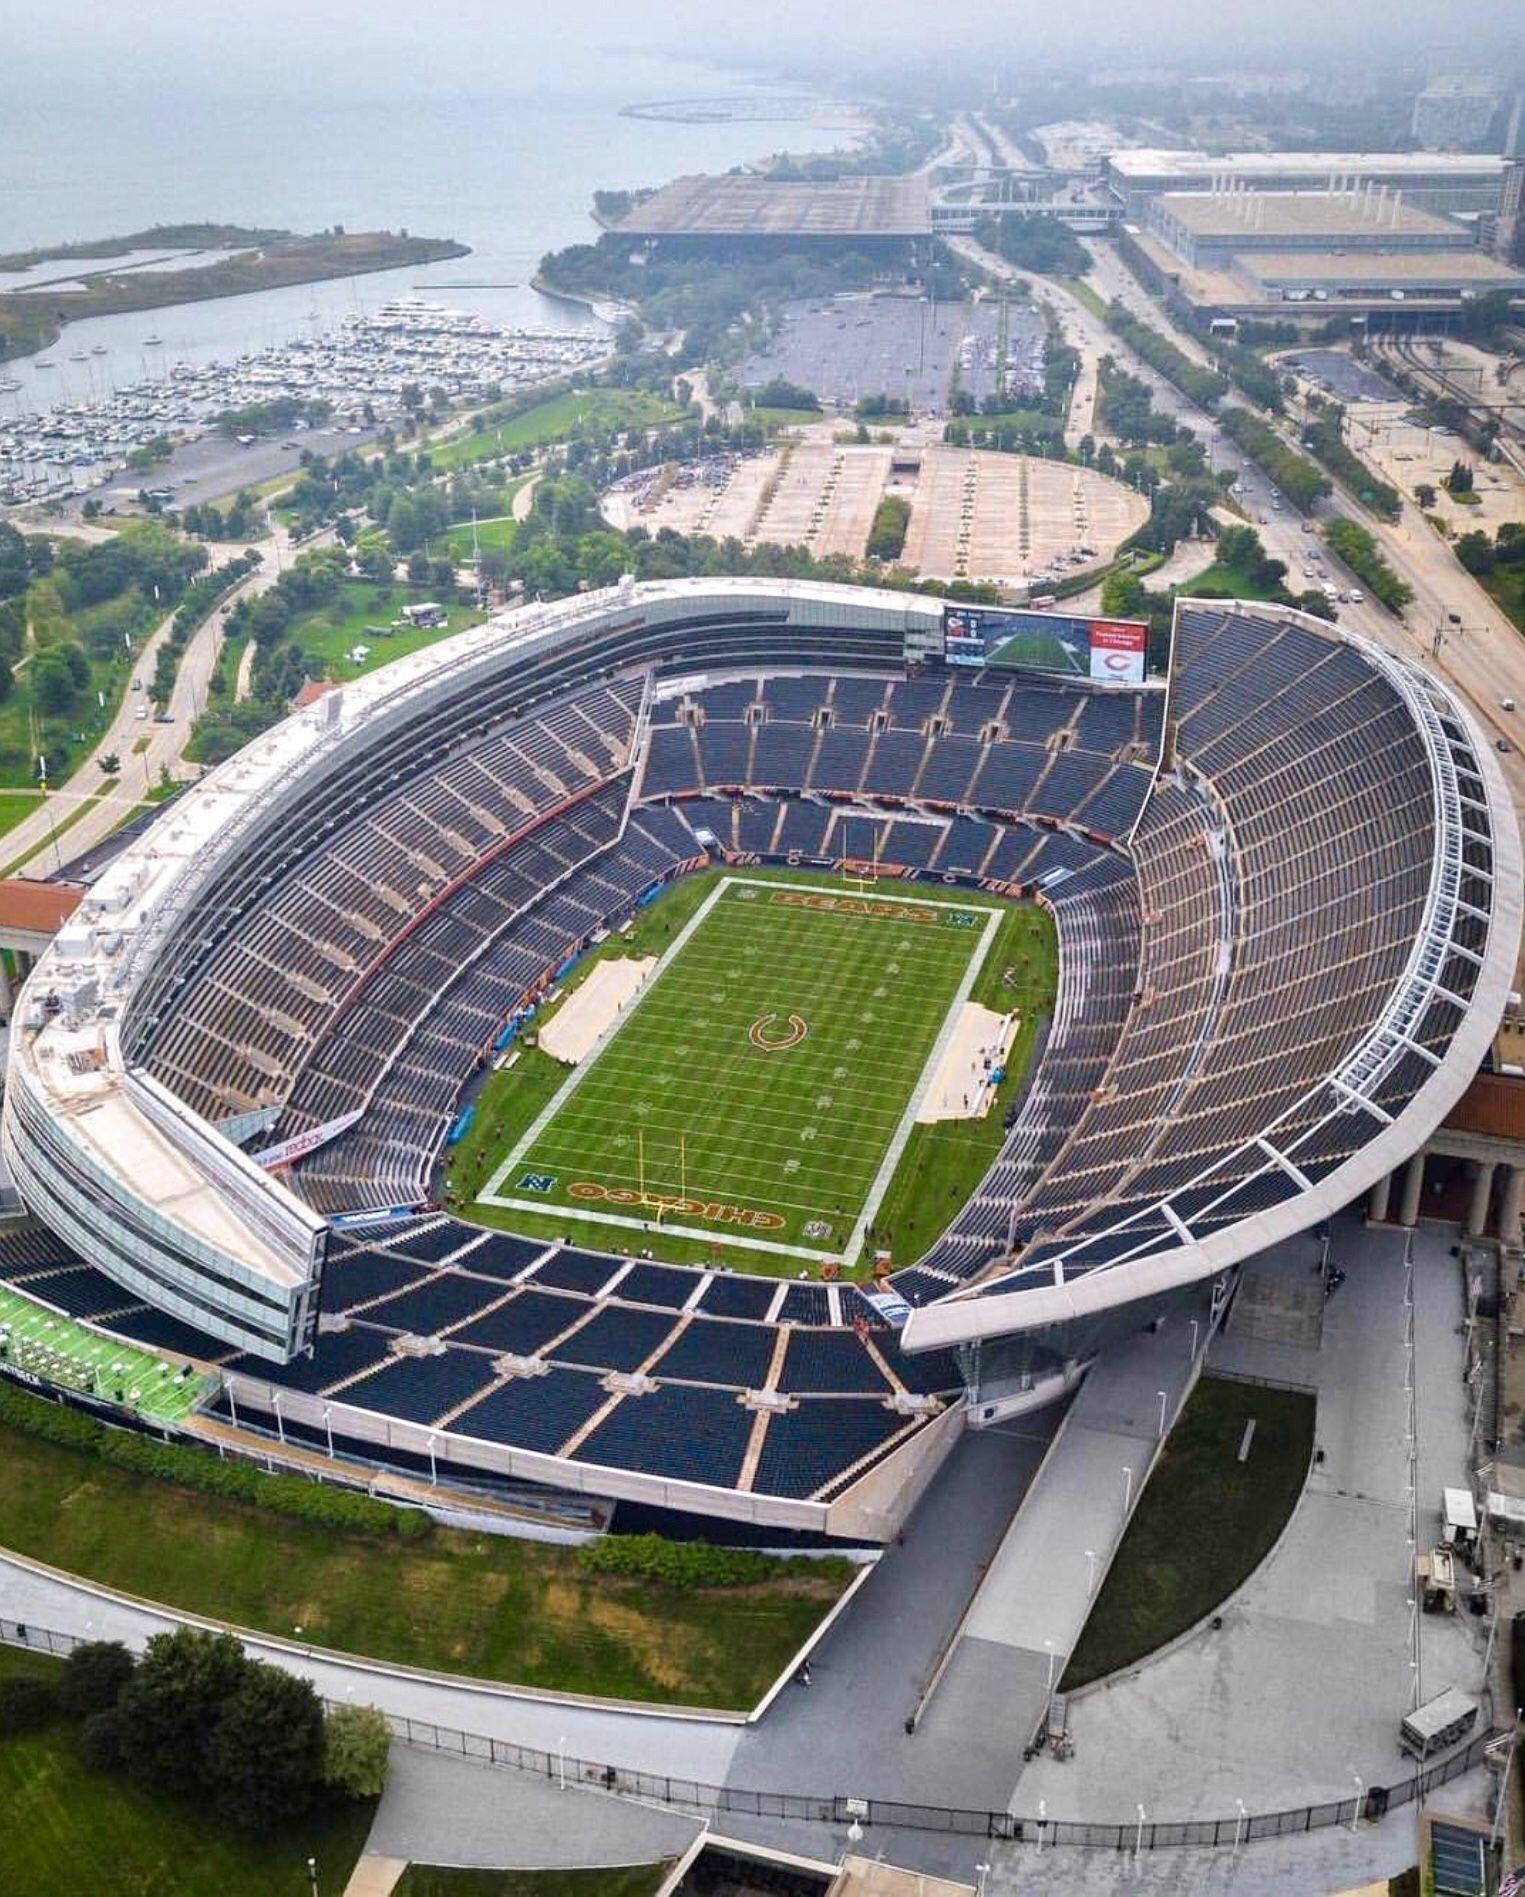 Post Psl With Images Stadium Architecture Nfl Stadiums Soccer Stadium